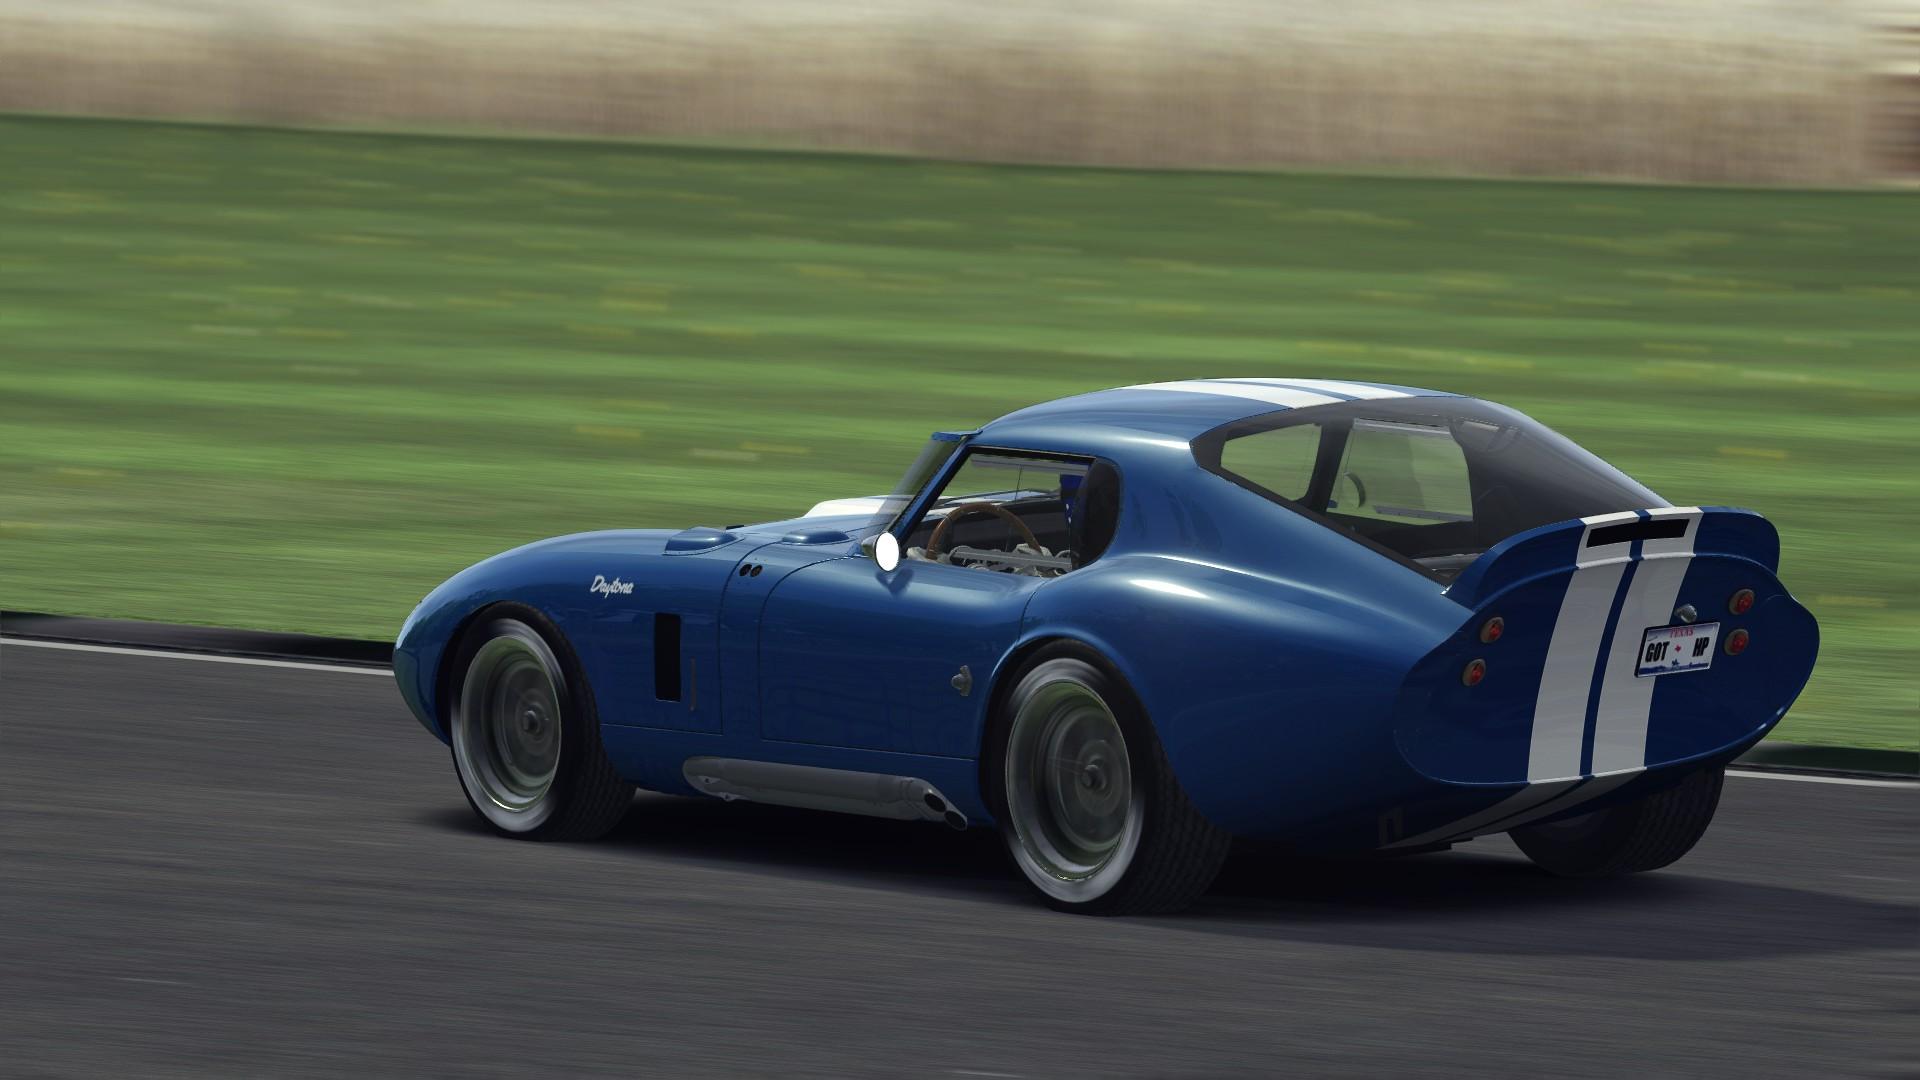 Shelby Daytona Coupe AC1.16.x 078_032018.jpg